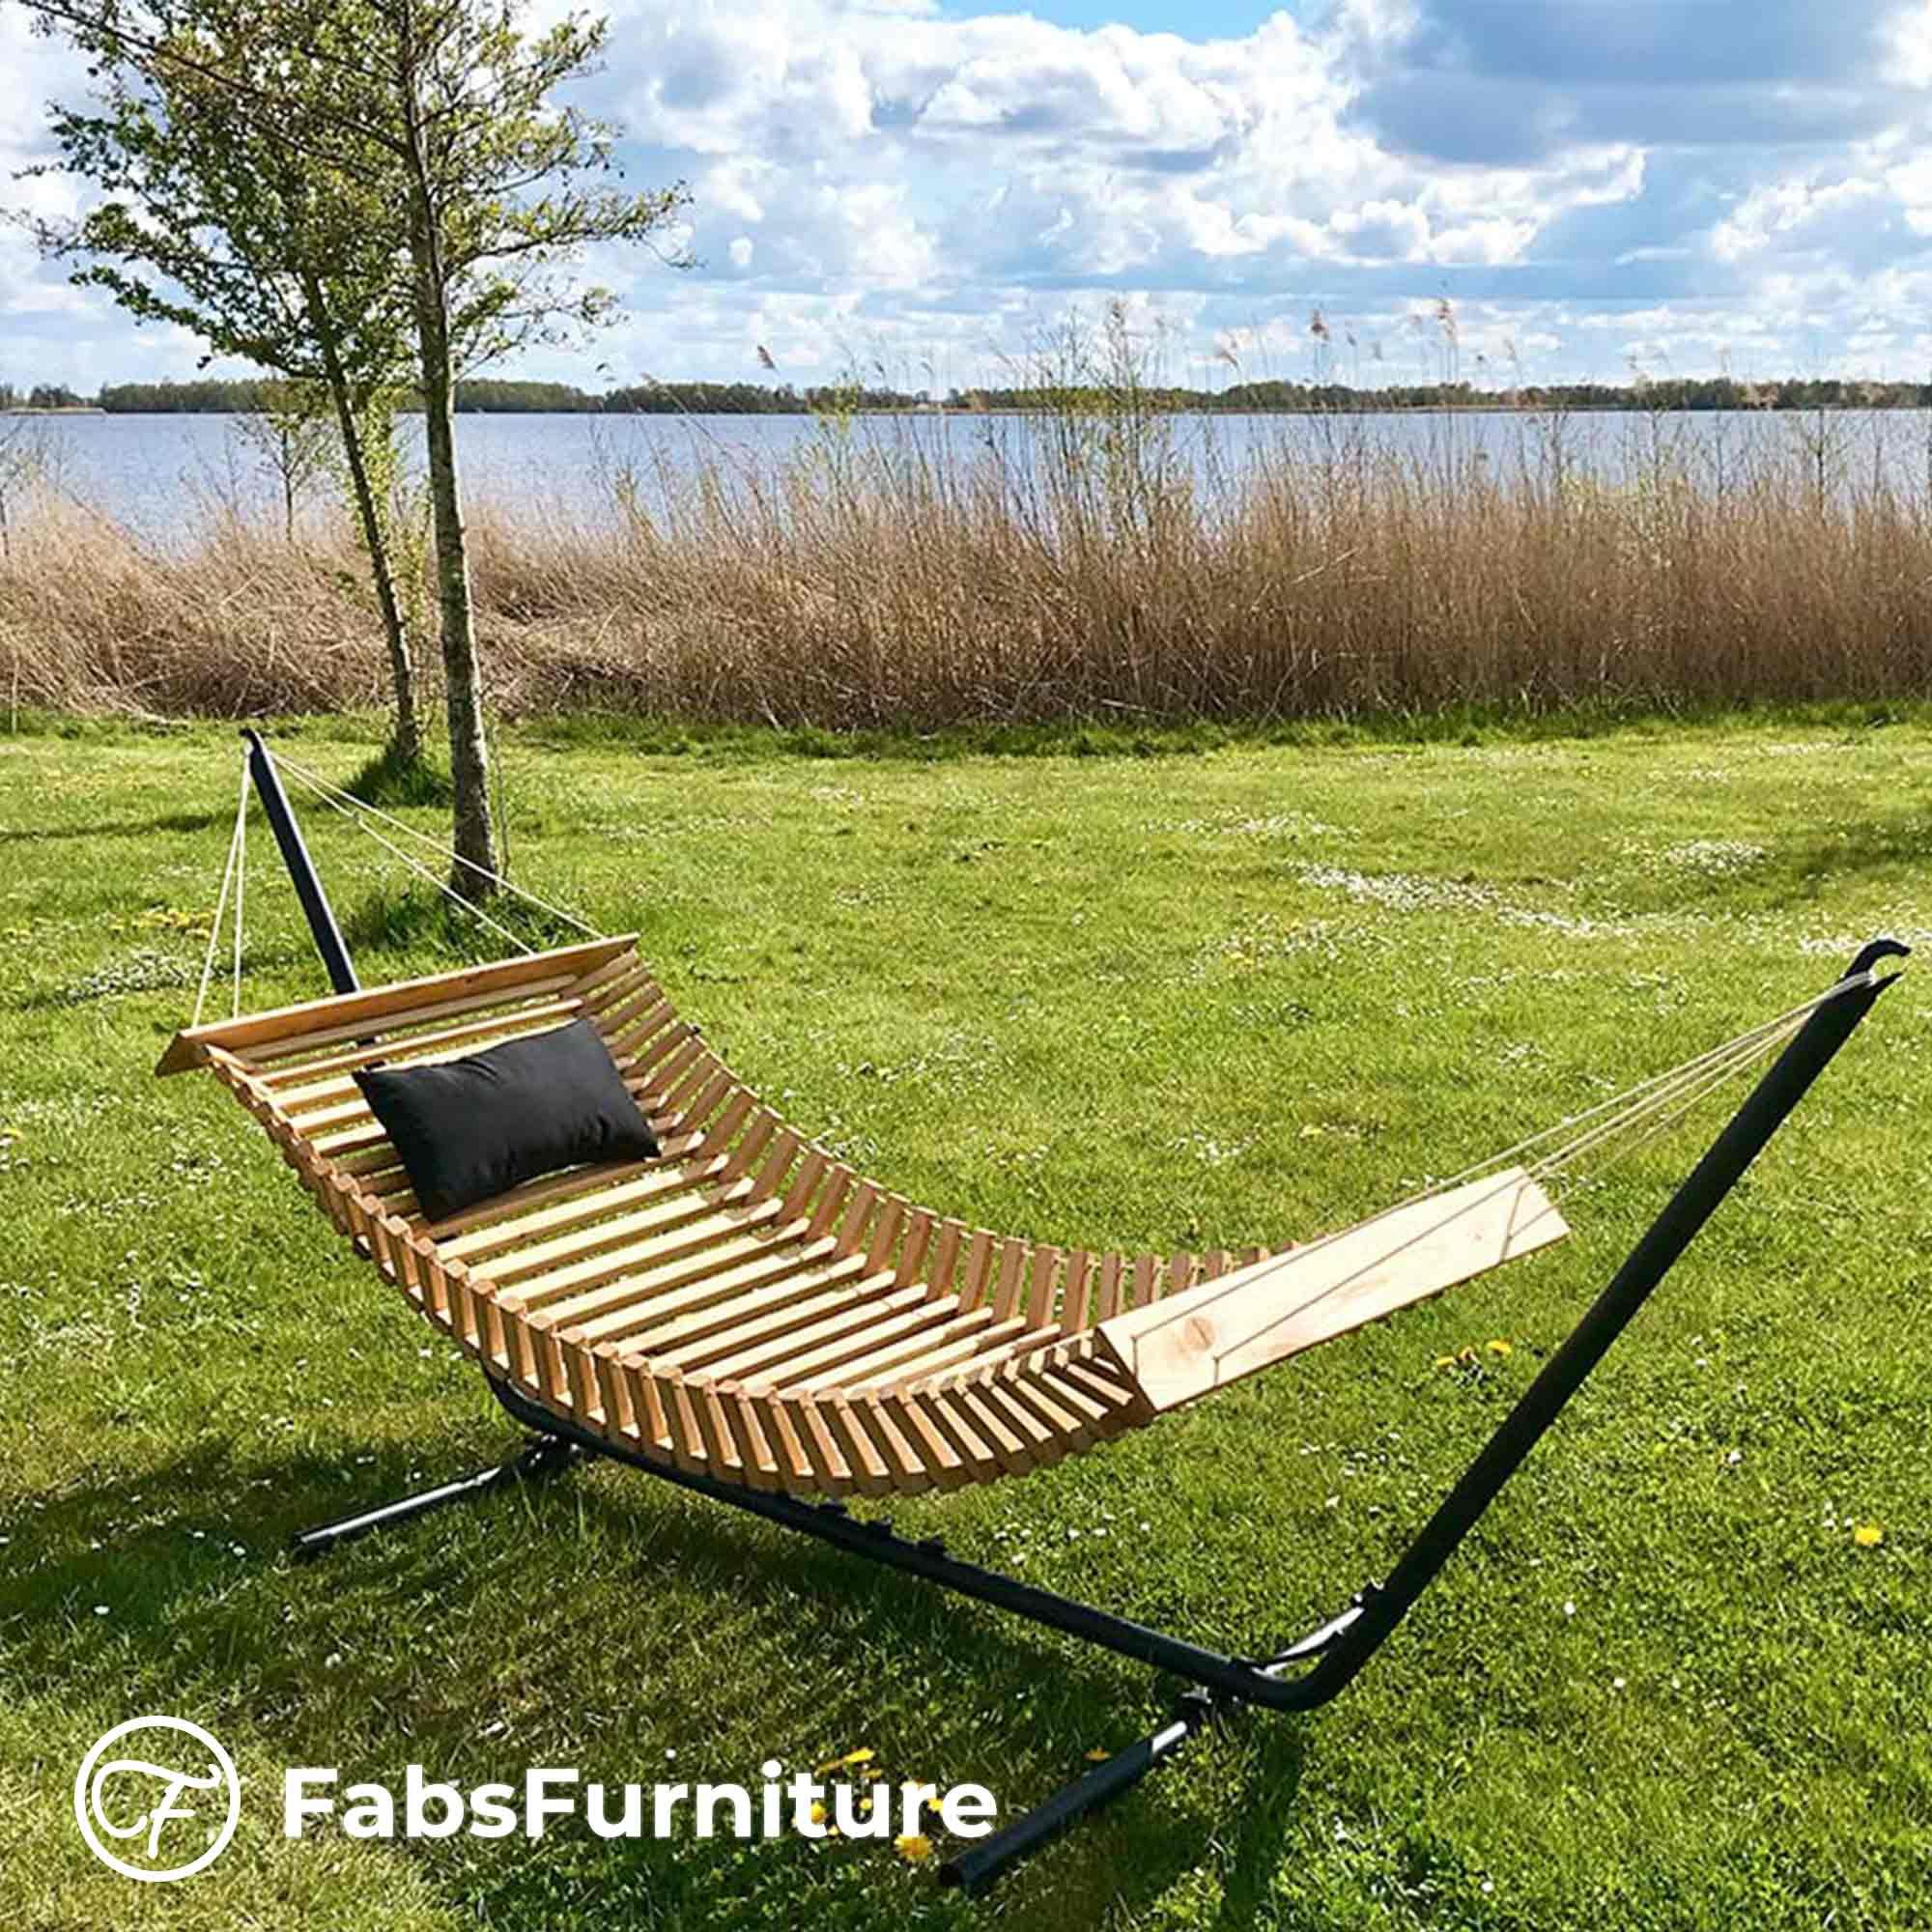 FabsFurniture - Hamac Bois - Hamac en Bois - Nieuwkoop - Les Pays-Bas